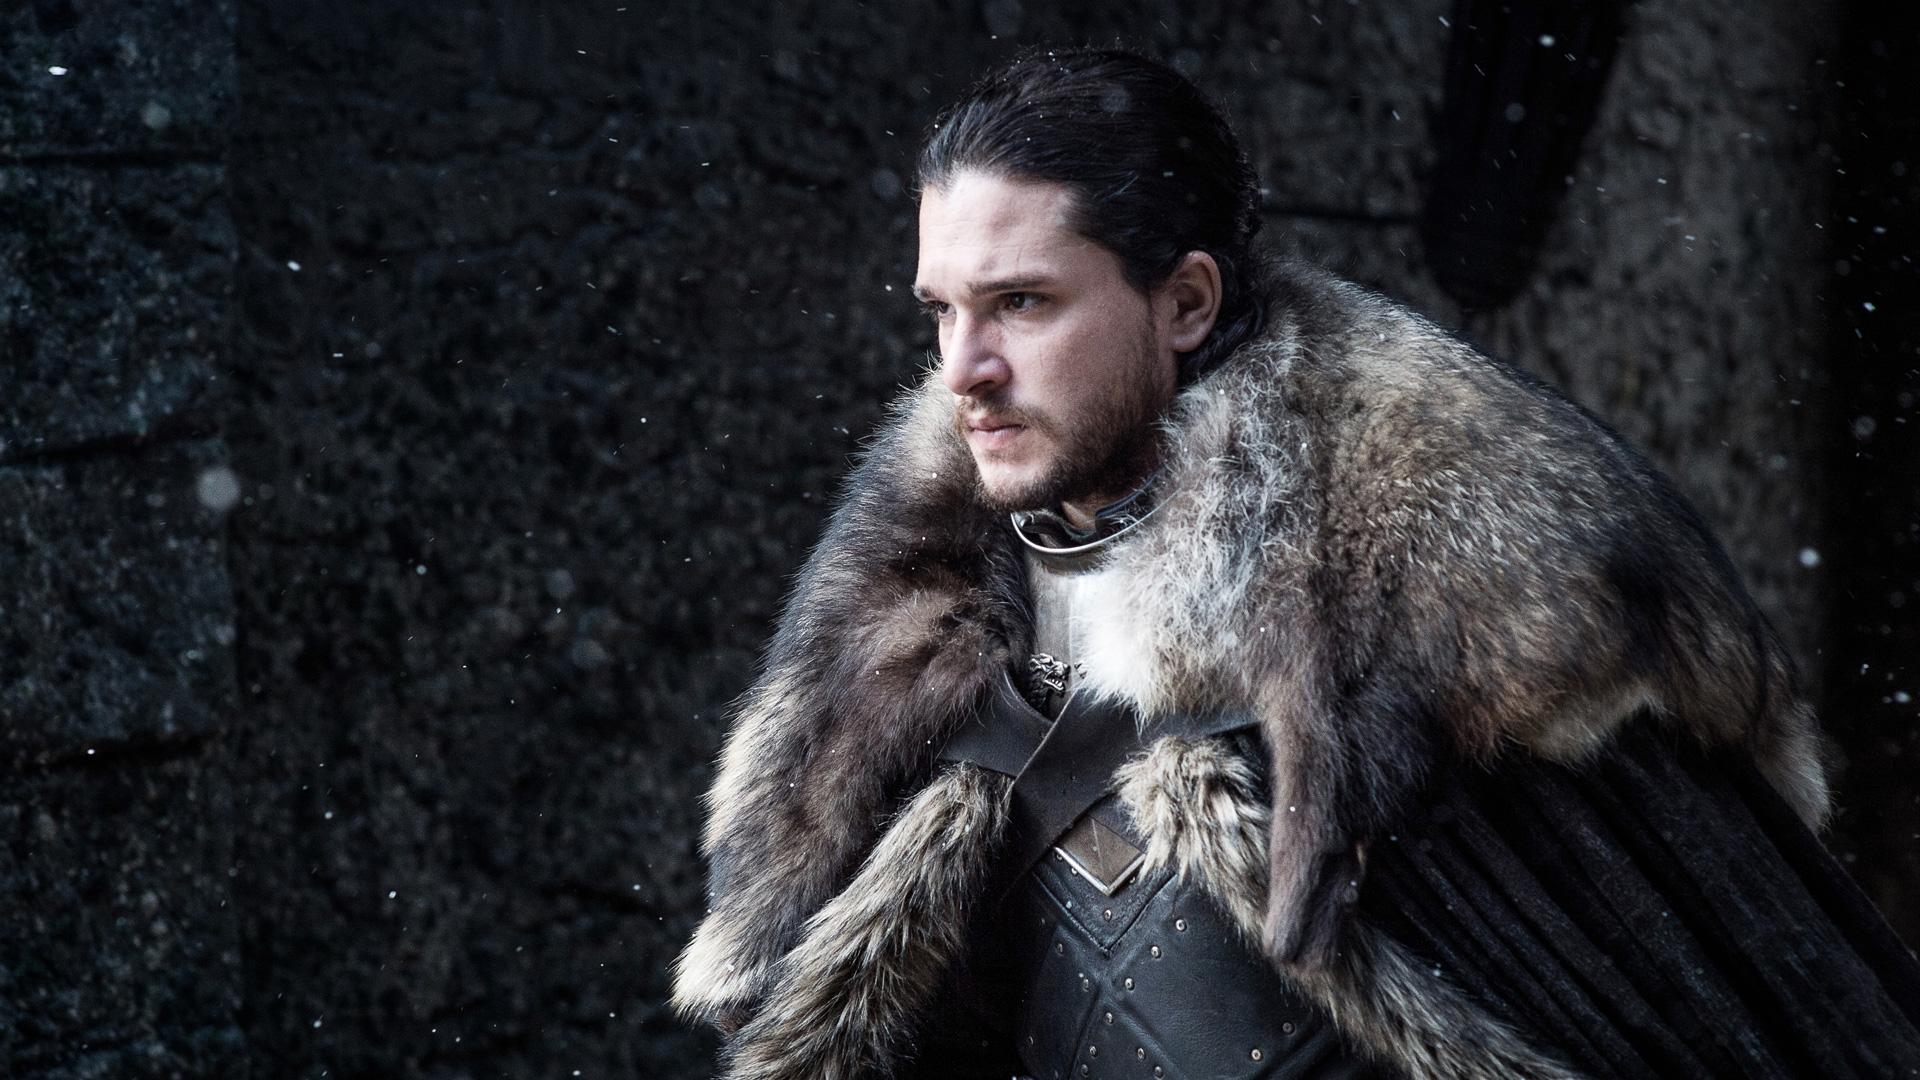 Should Jon Snow Head South